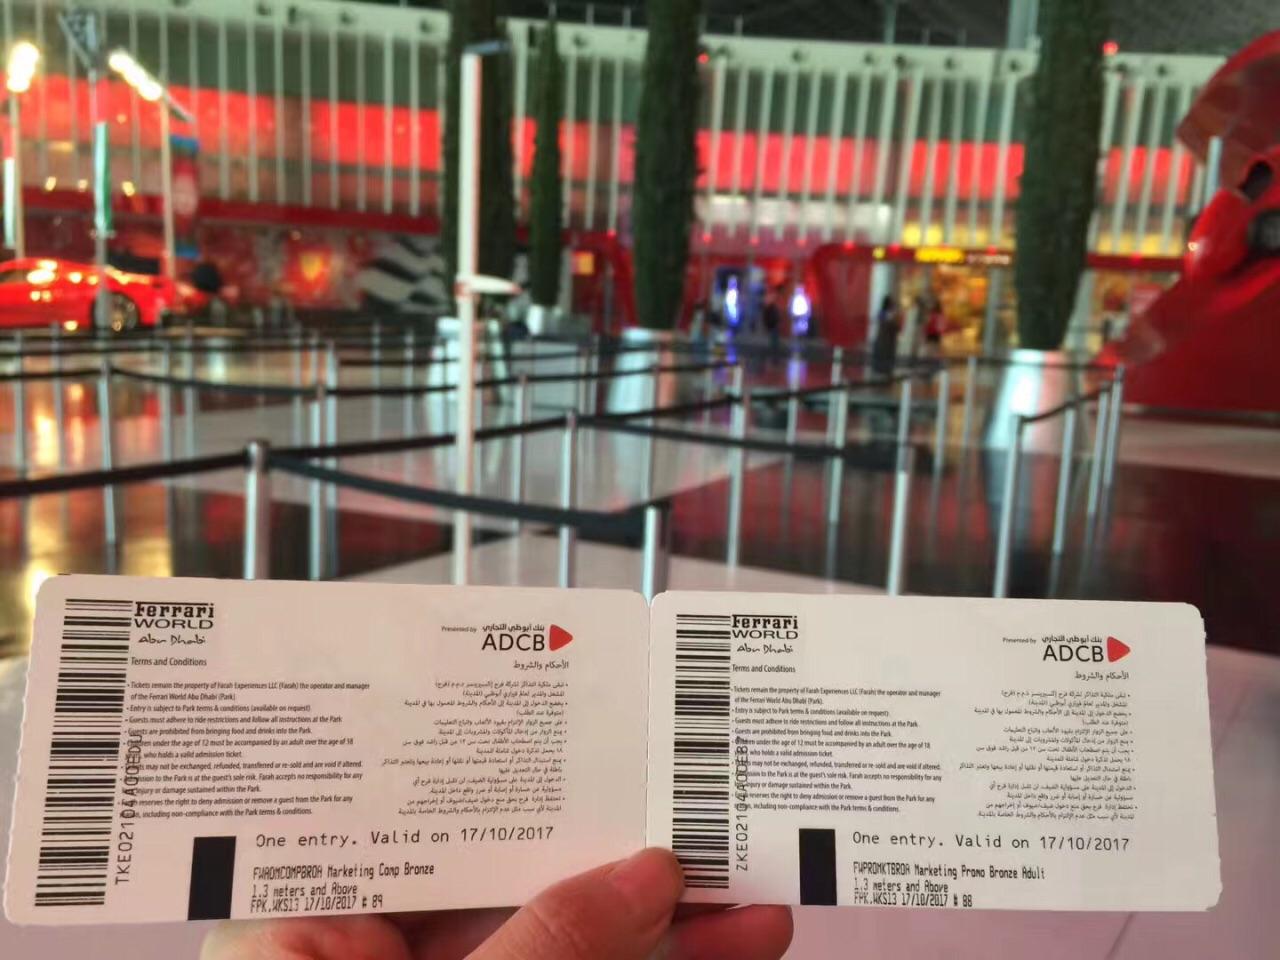 Ferrari World Abu Dhabi | Tickets, Deals, Reviews, Family Holidays